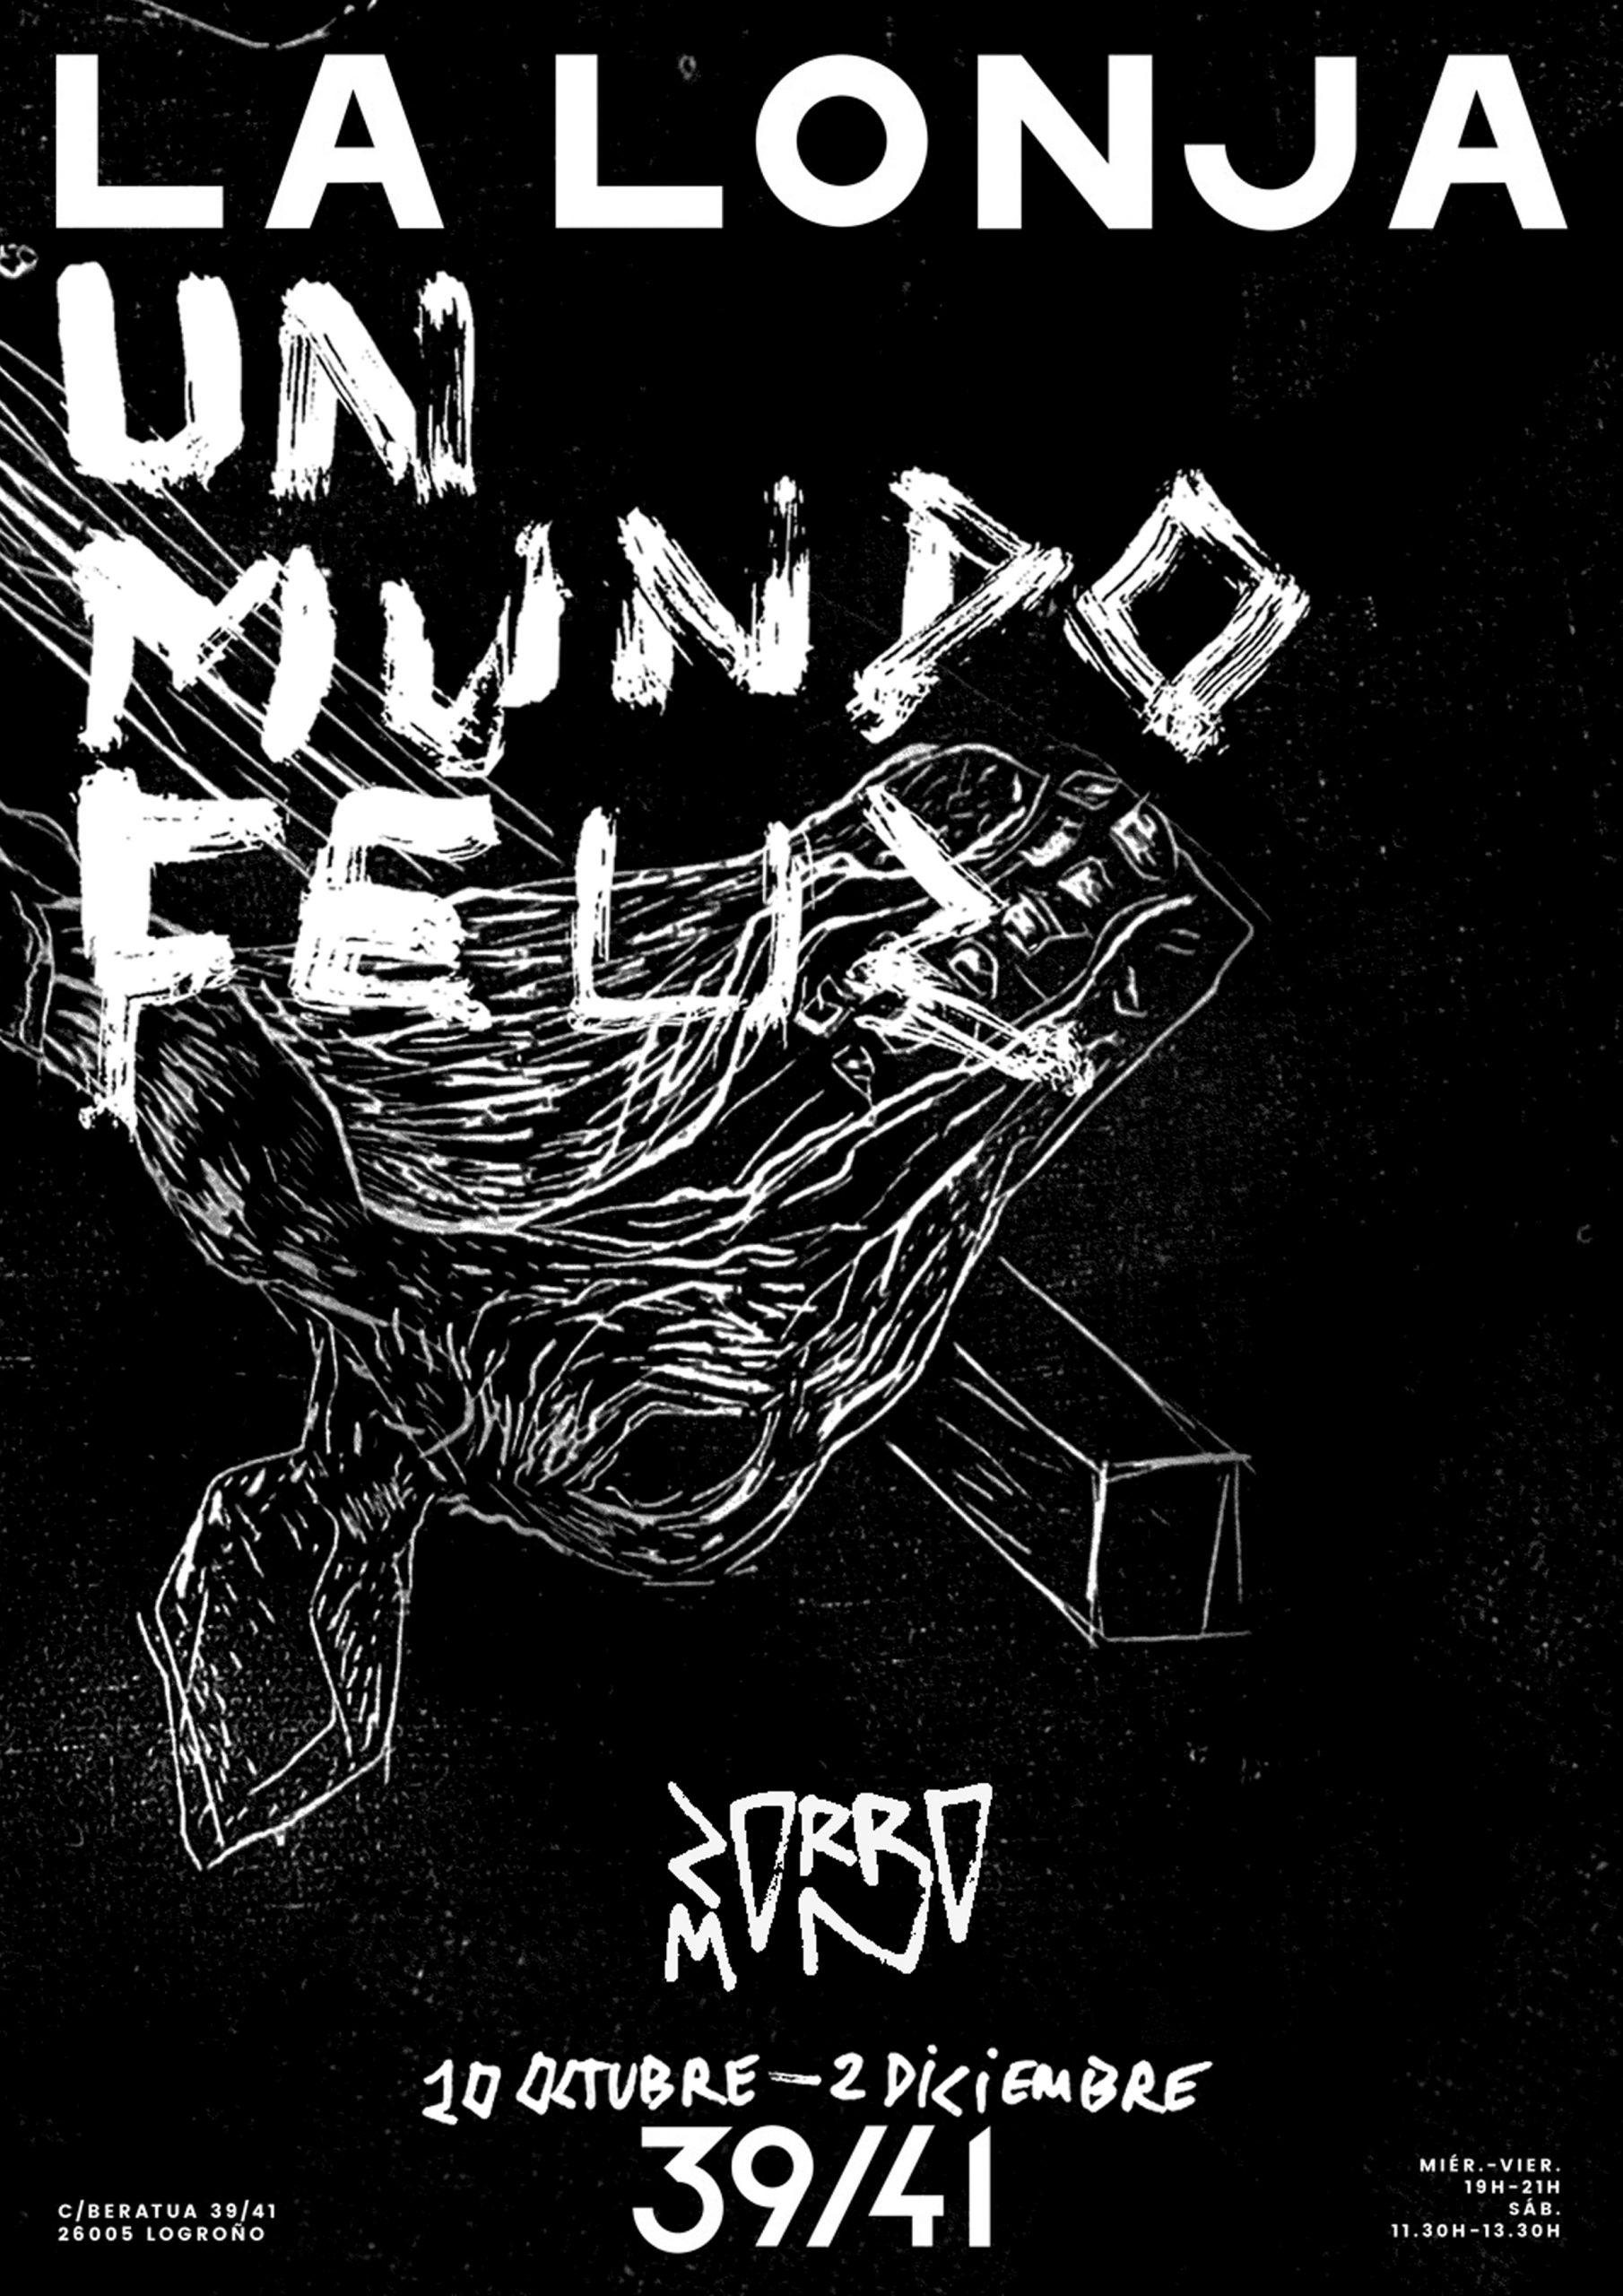 UN MUNDO FELIZ / CARLOS ZORROMONO 20.OCT.- 2.DIC.2017